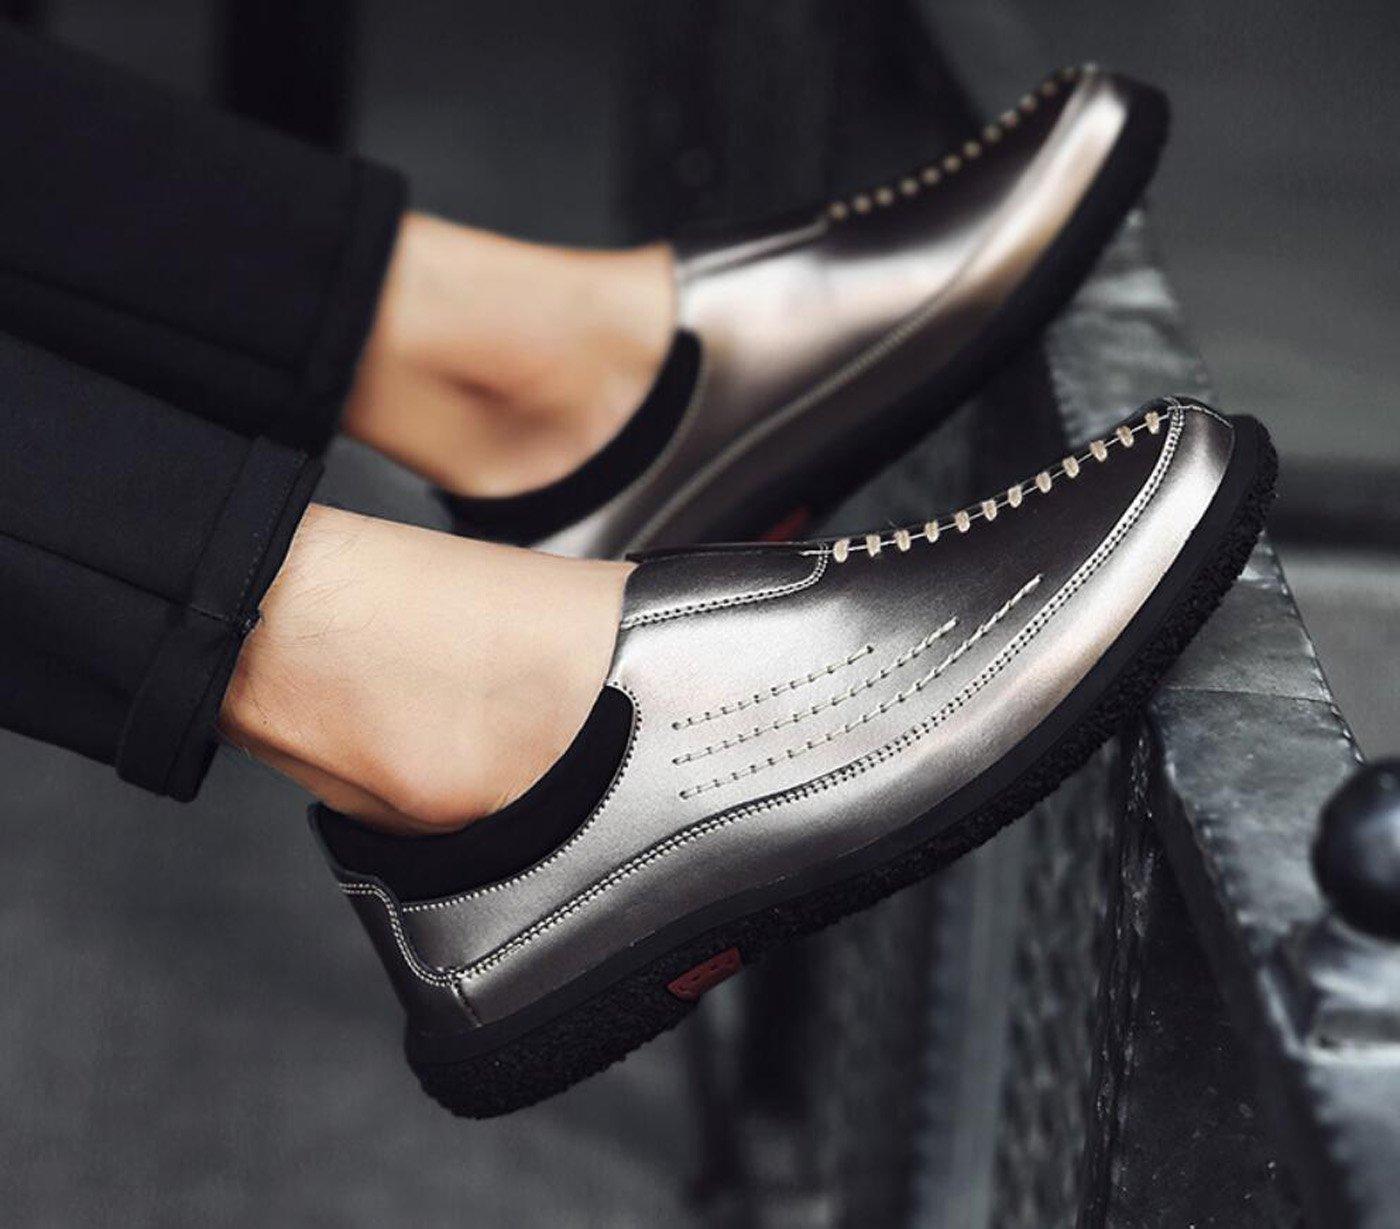 GDXH Herren Lederschuhe Business Casual Schuhe Schuhe Schuhe Loafers Fashion Driving Schuhe Formale Schuhe cfbddc